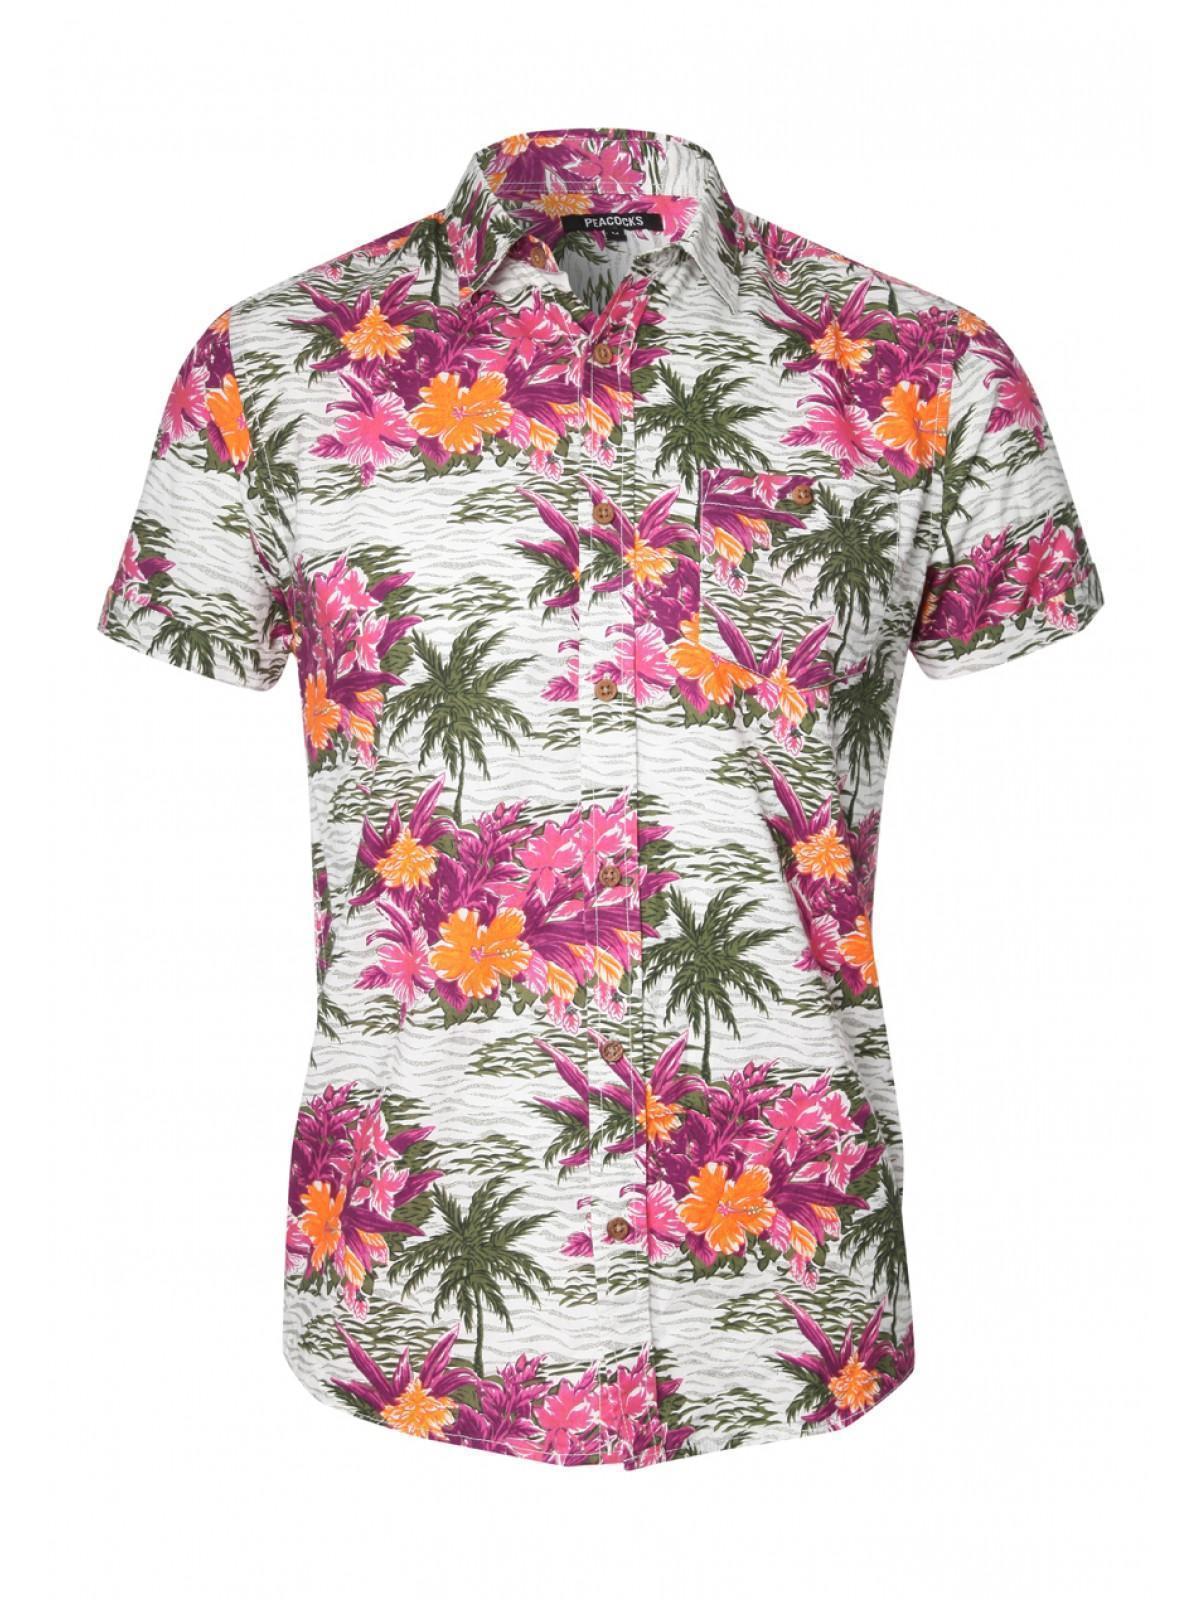 Mens Short Sleeve Floral Hawaiian Shirt | Peacocks